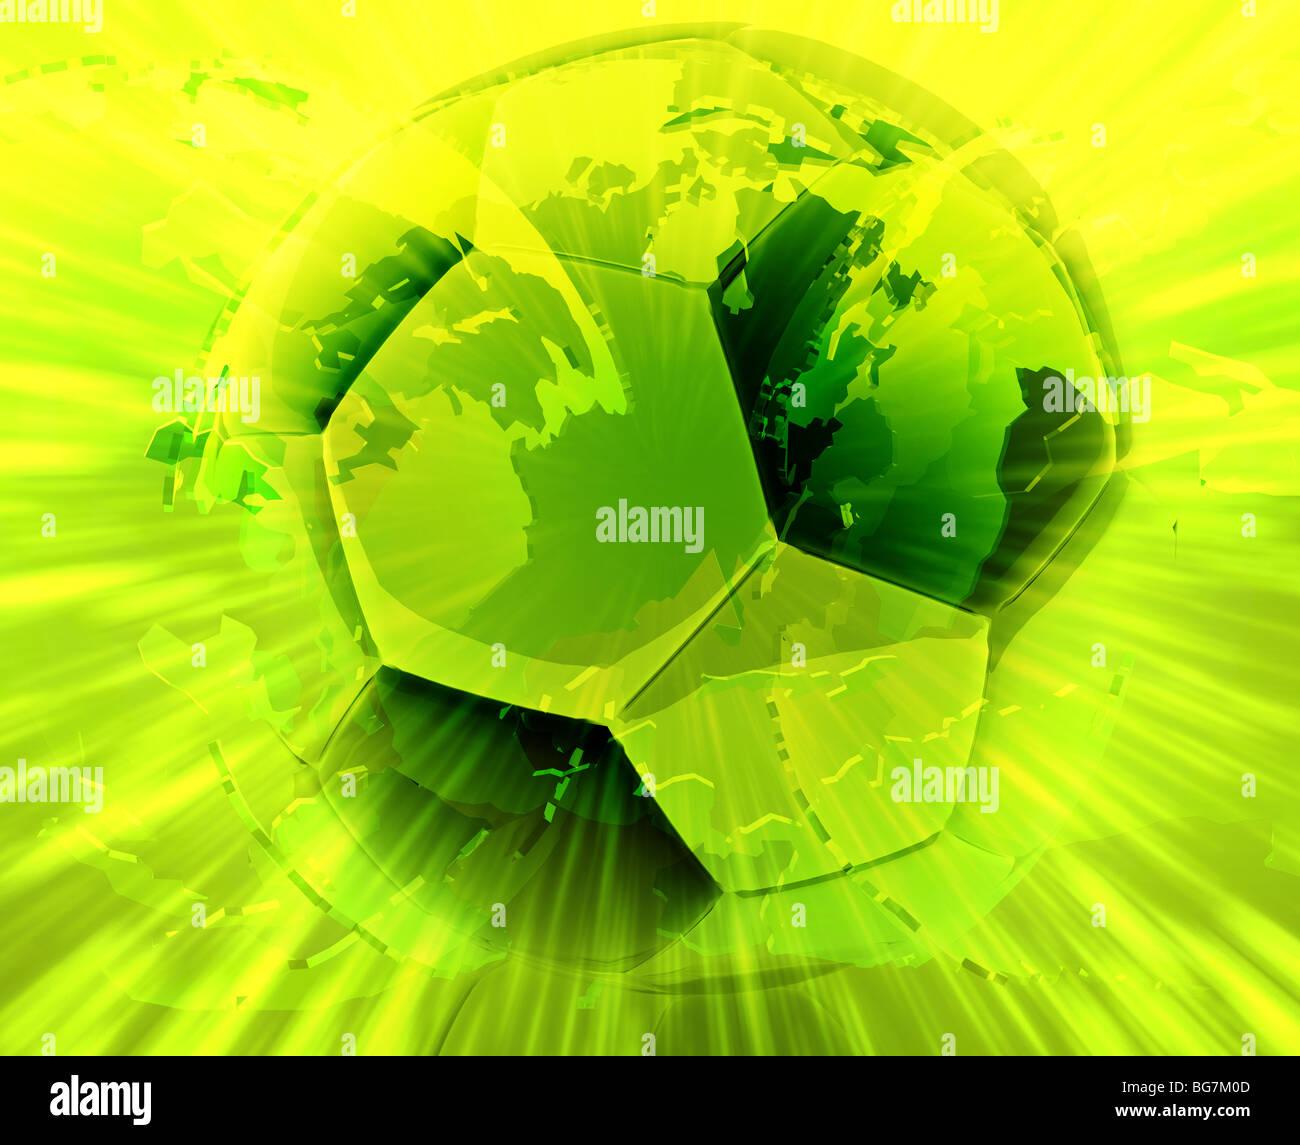 Internationalen Weltweit Moderne Fussball Ball Abstrakte